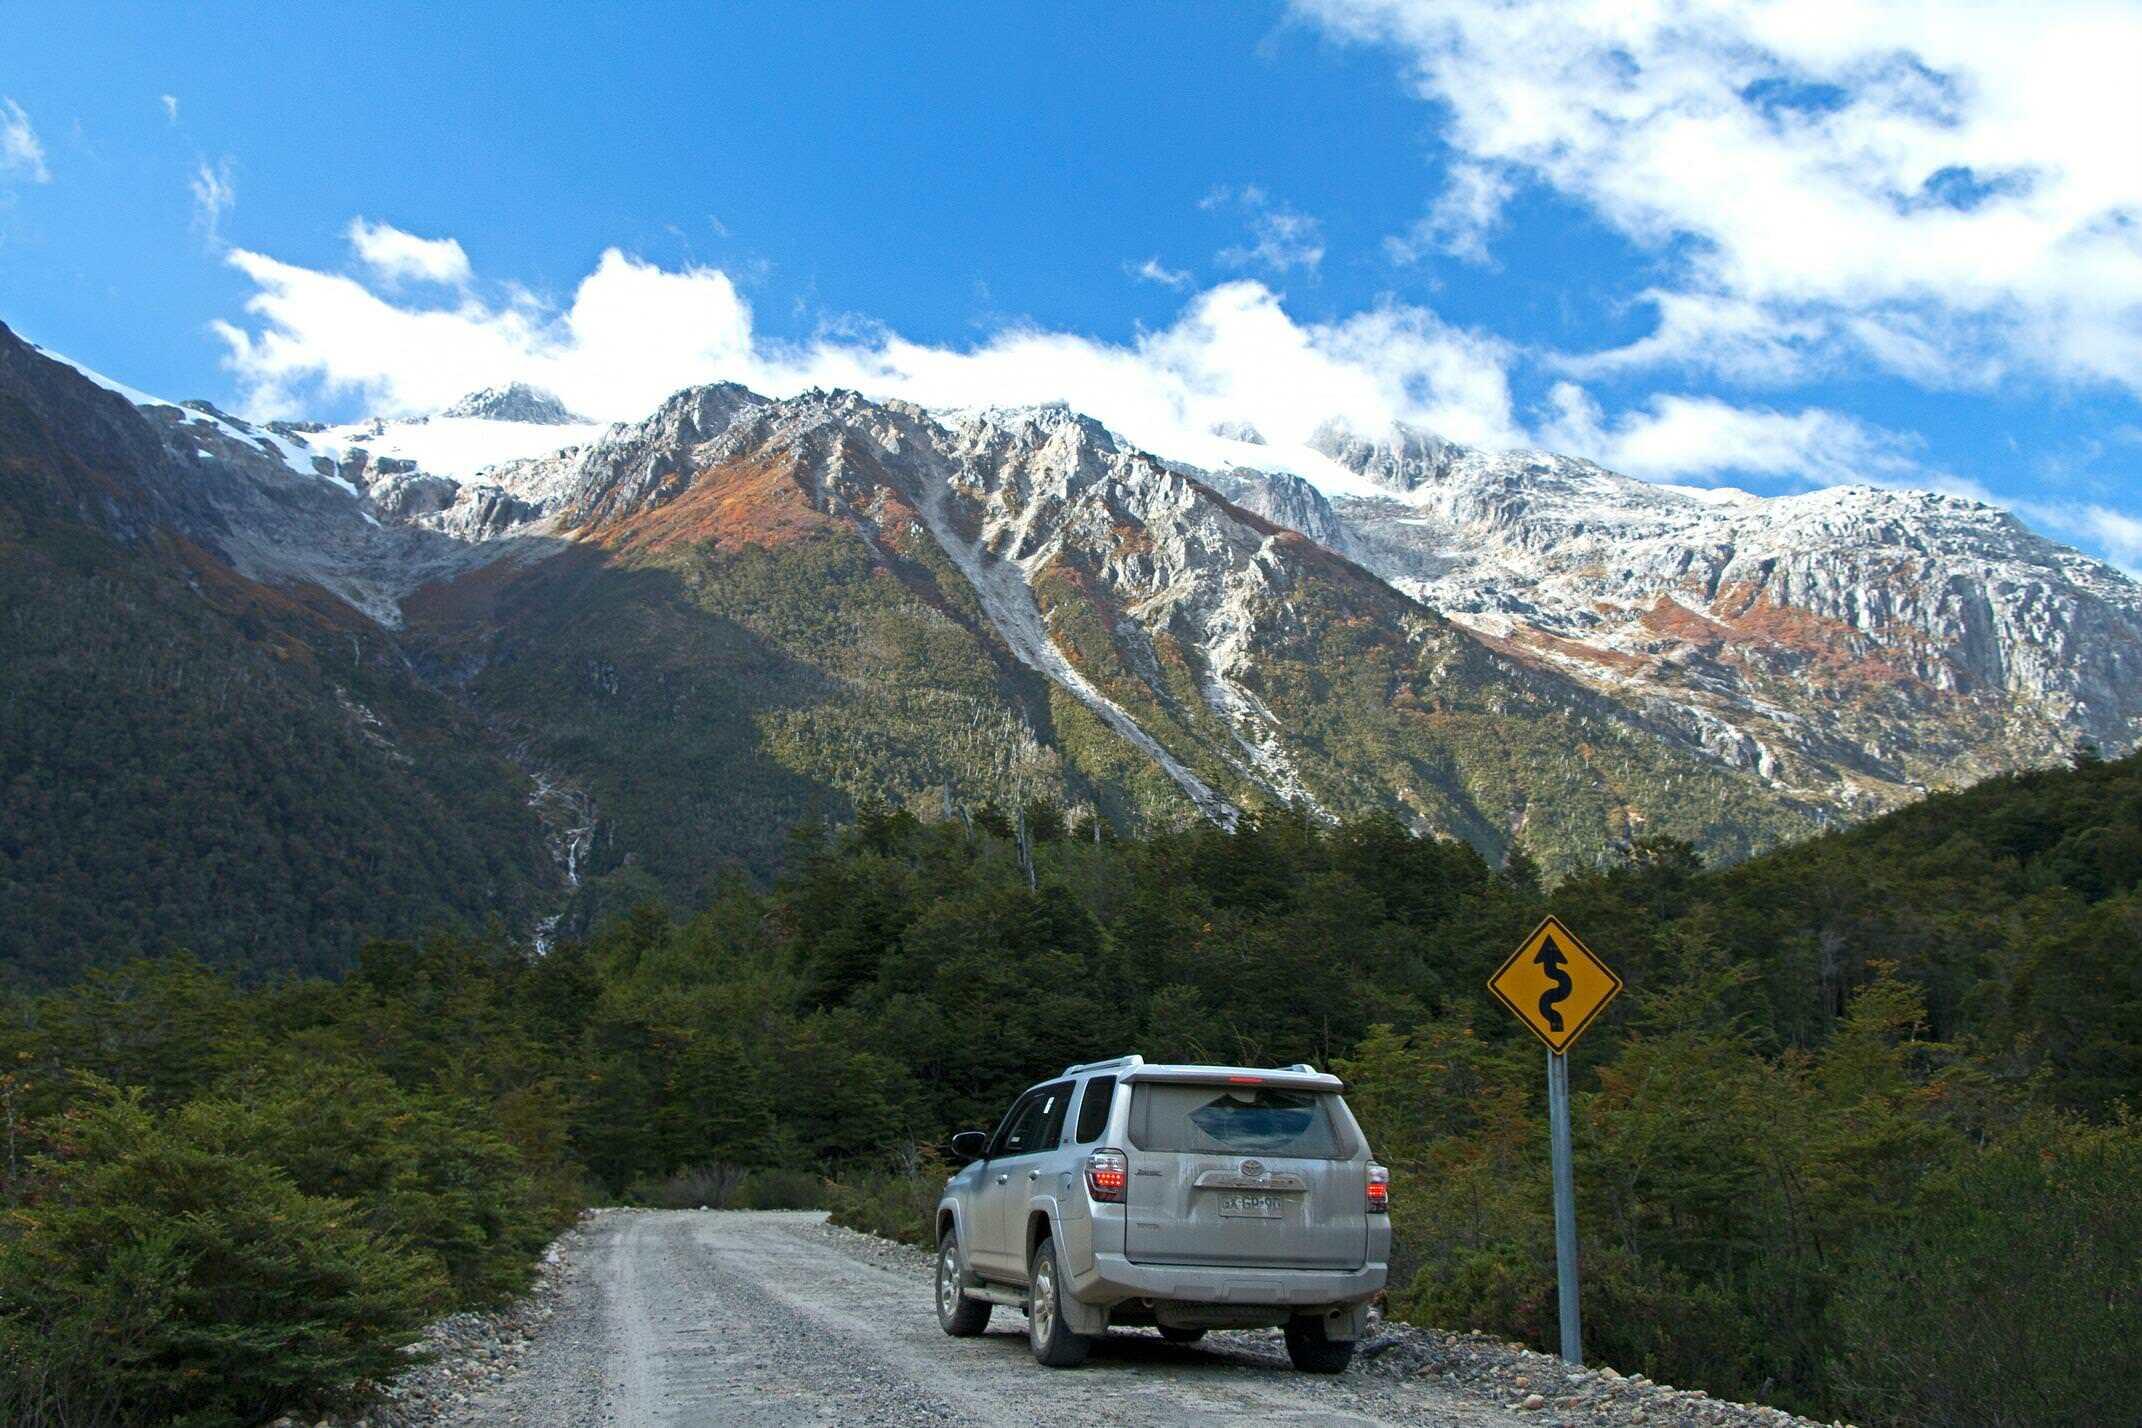 chile-carretera-austral-bahia-exploradores-carretera-austral-highway-7-chile.jpg